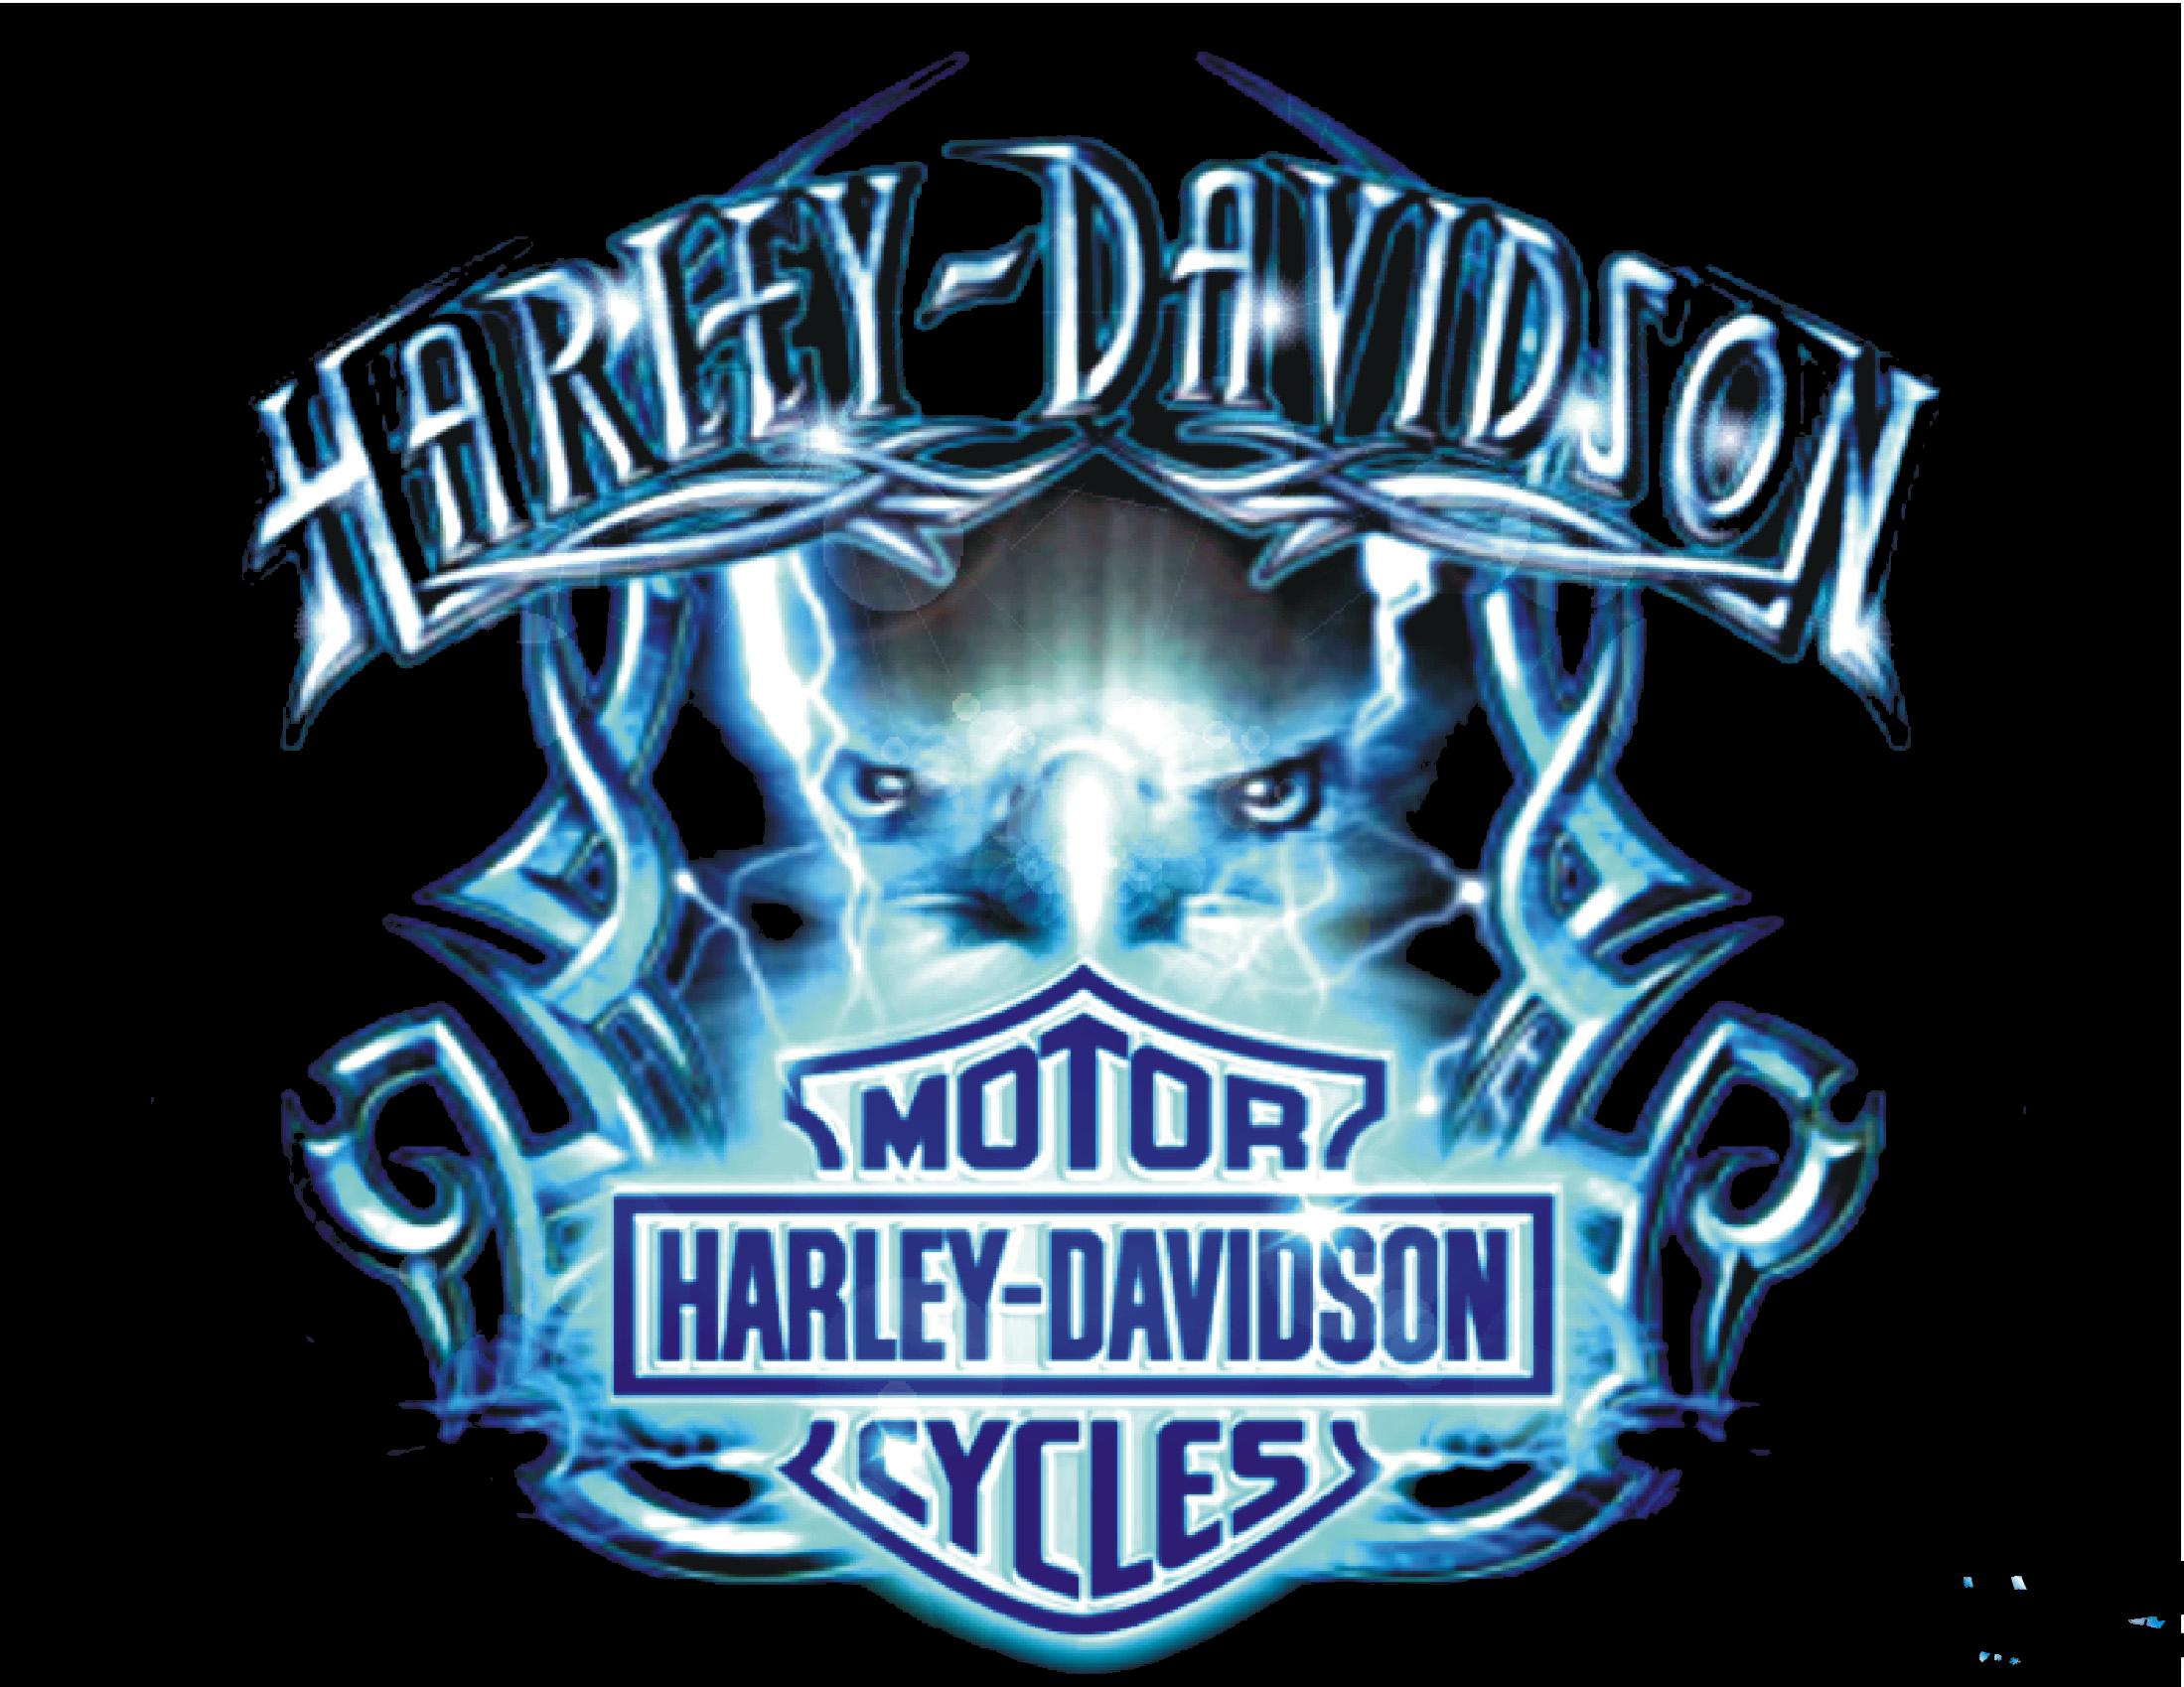 Harley Davidson Logo Png Harley Davidson Wallpaper Harley Davidson Posters Harley Davidson